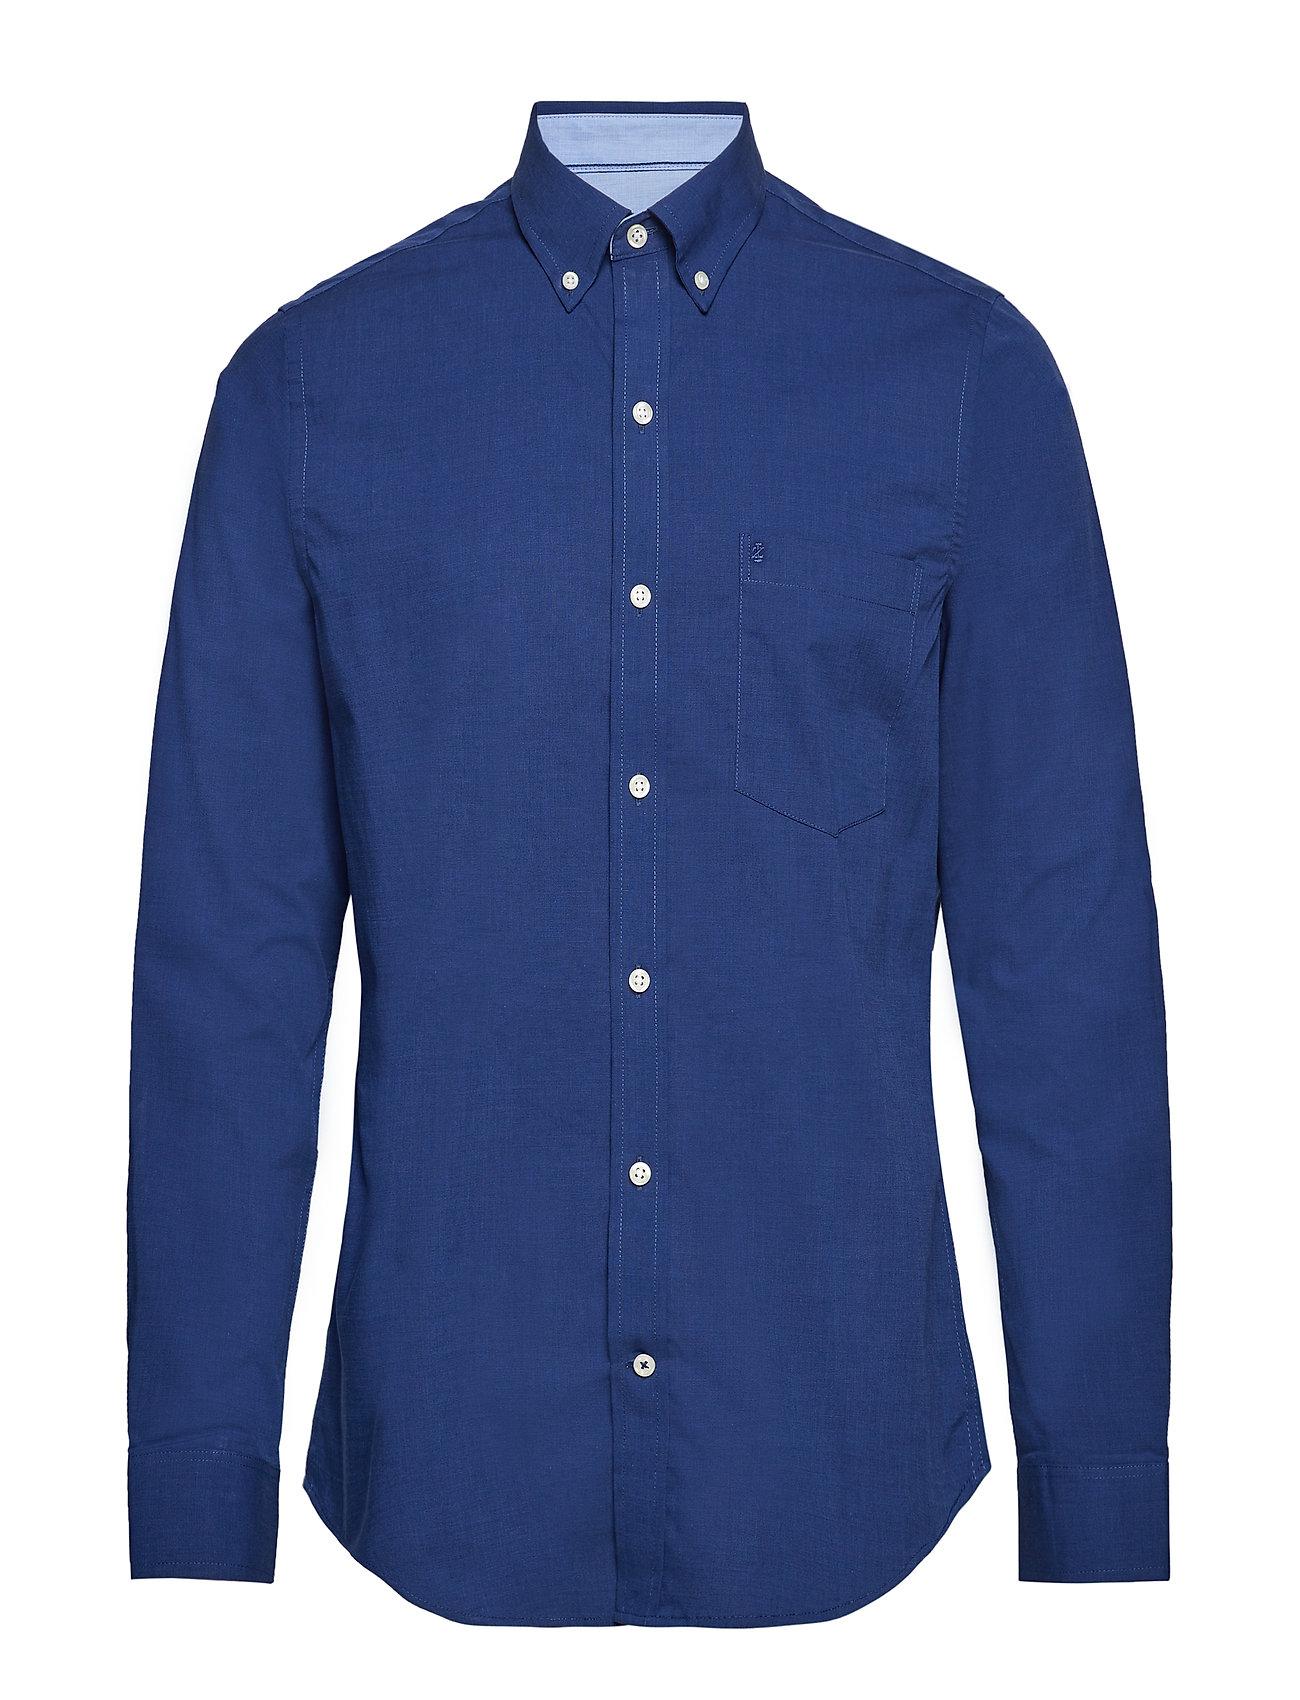 Shirtsp Details Bd With PeacoatIzod End On 35ARSjc4Lq